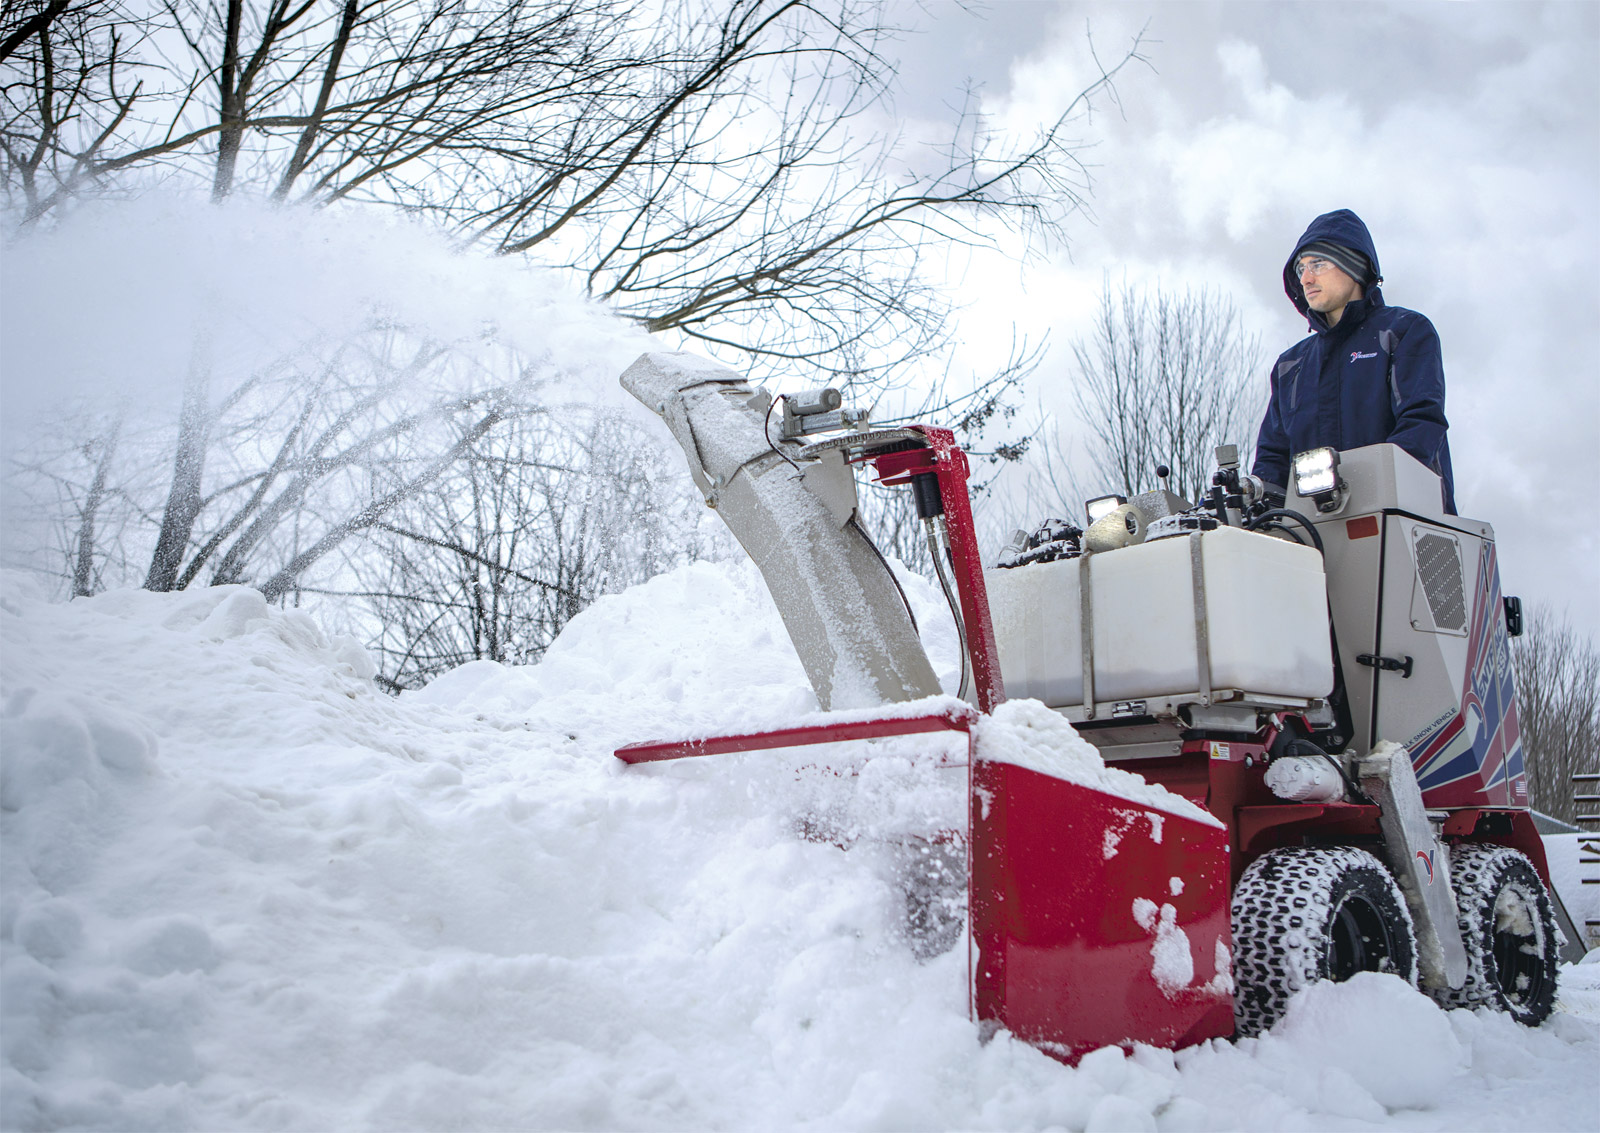 Ventrac SSV - Sidewalk Snow Vehicle